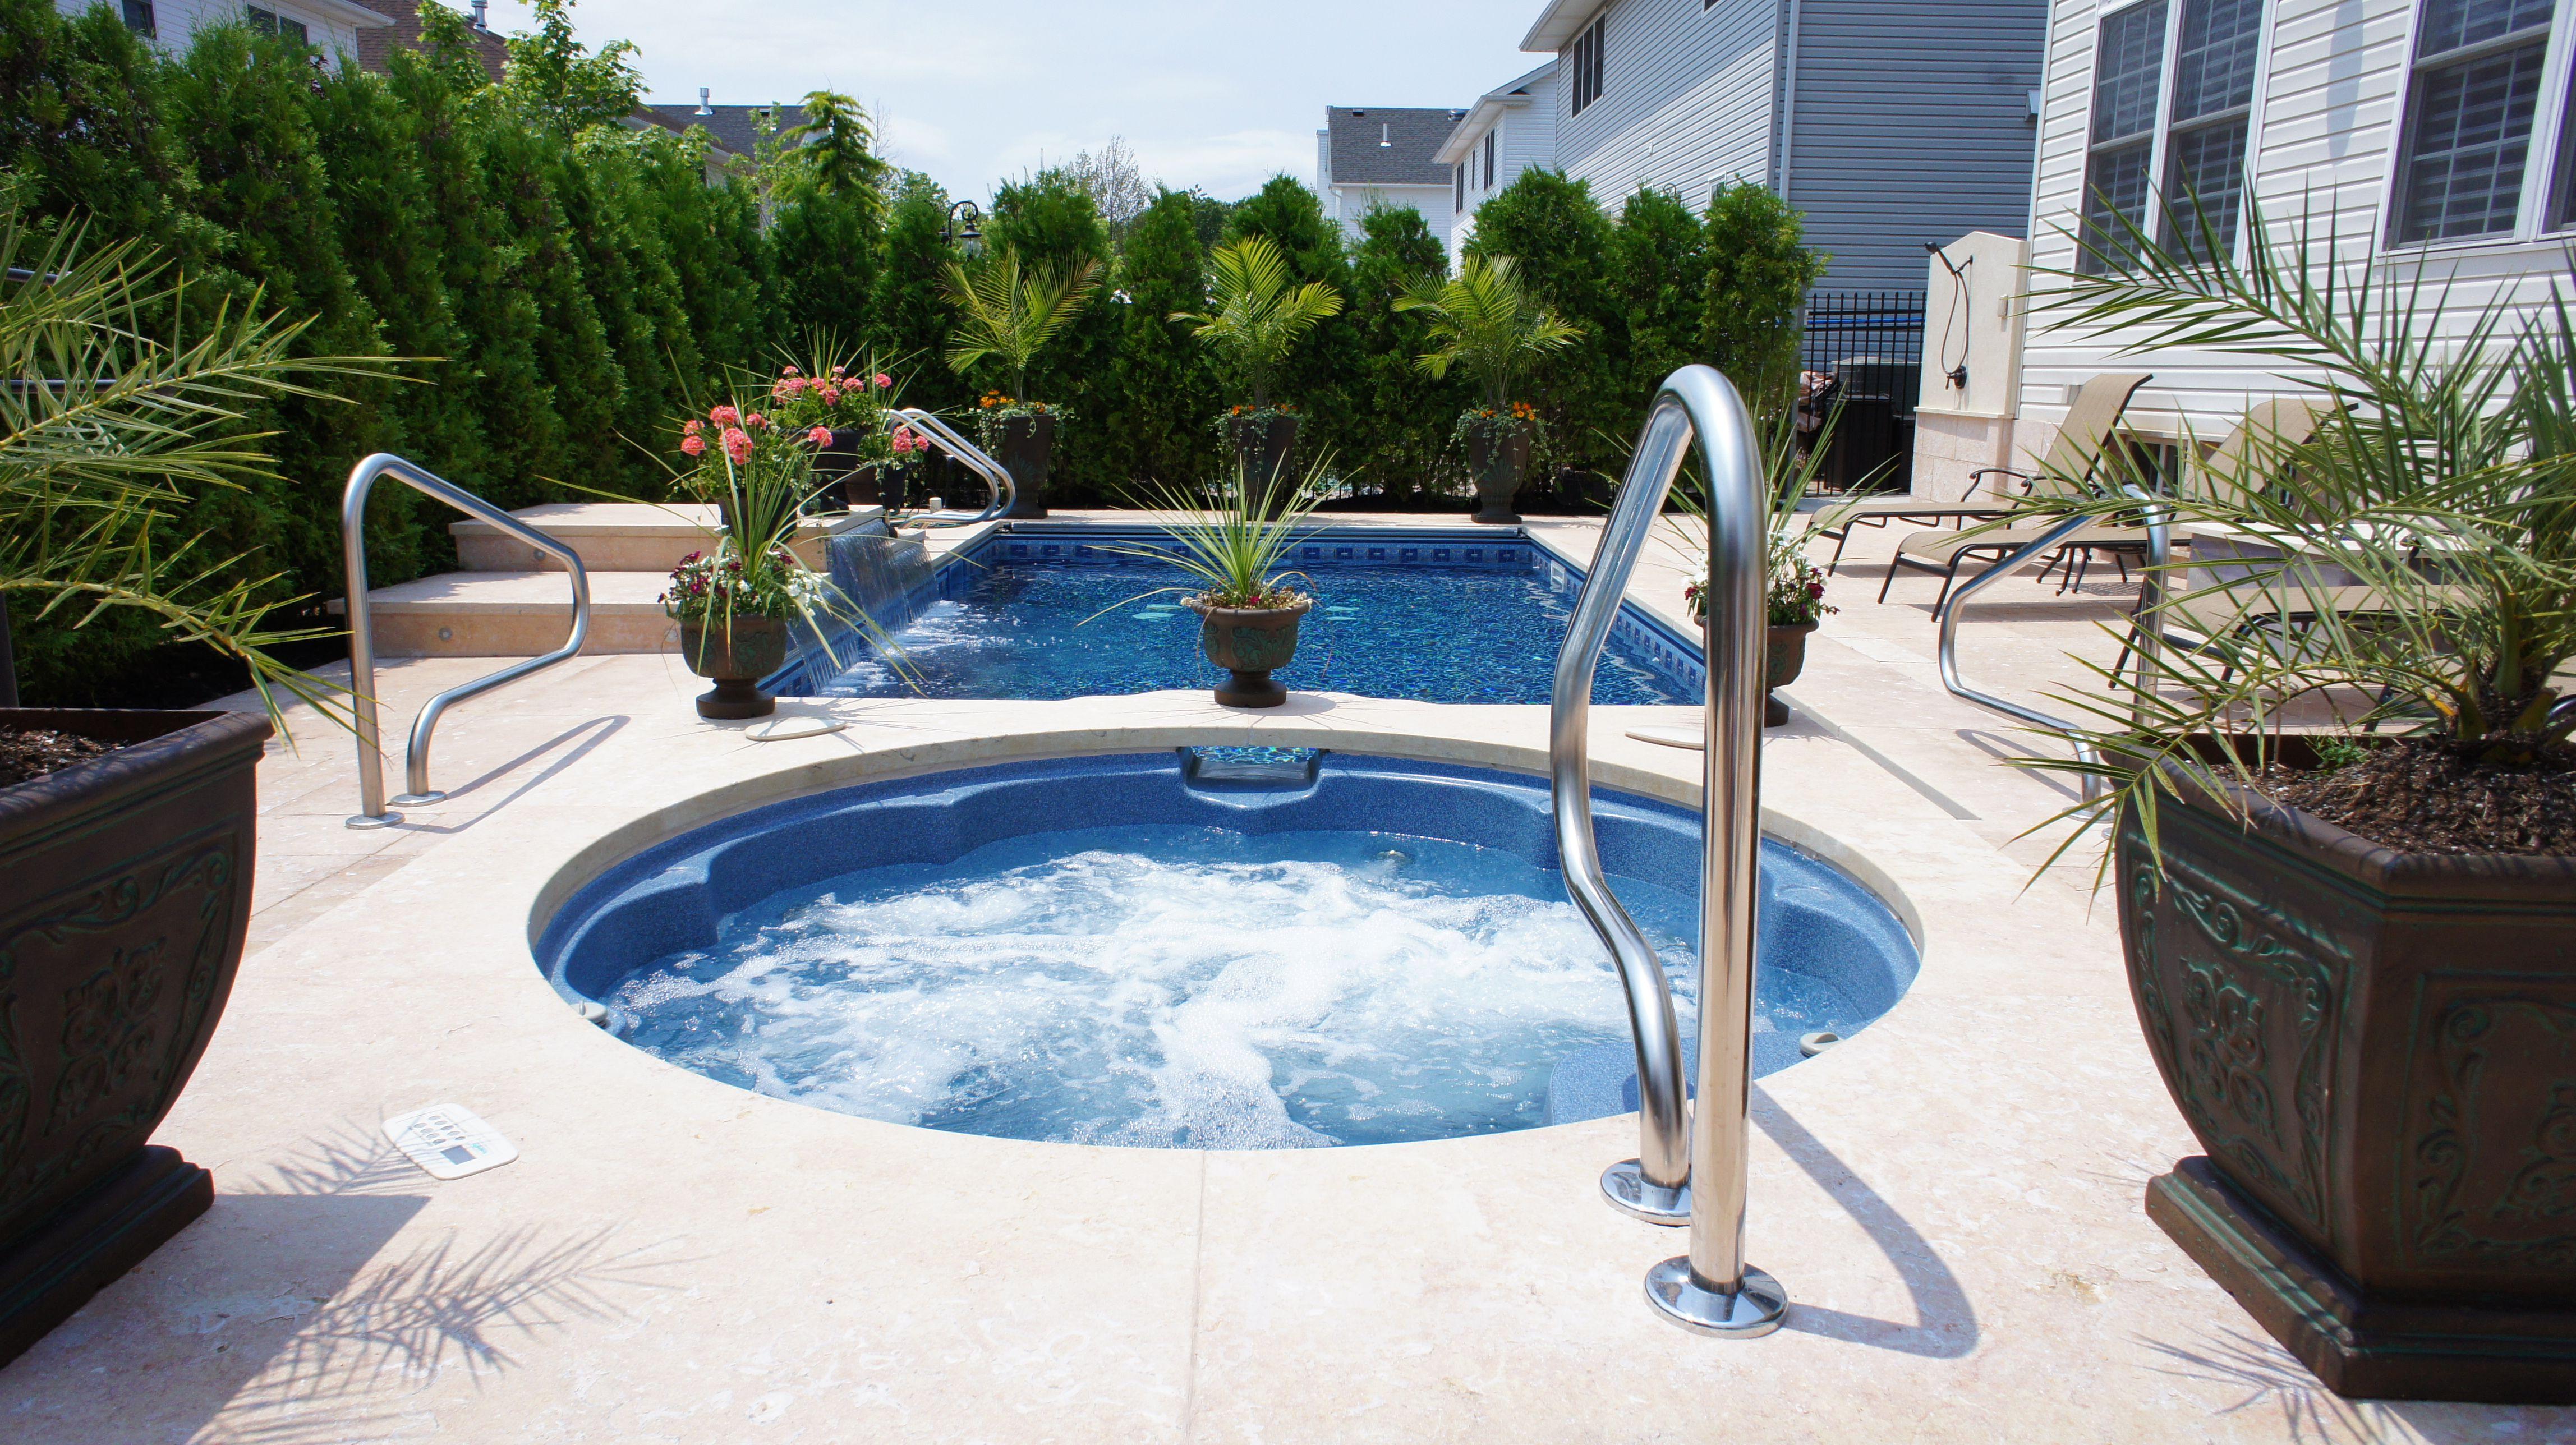 Outdoor Spa | Inground Hot Tub | Fiberglass | Mill Bergen Pools ...